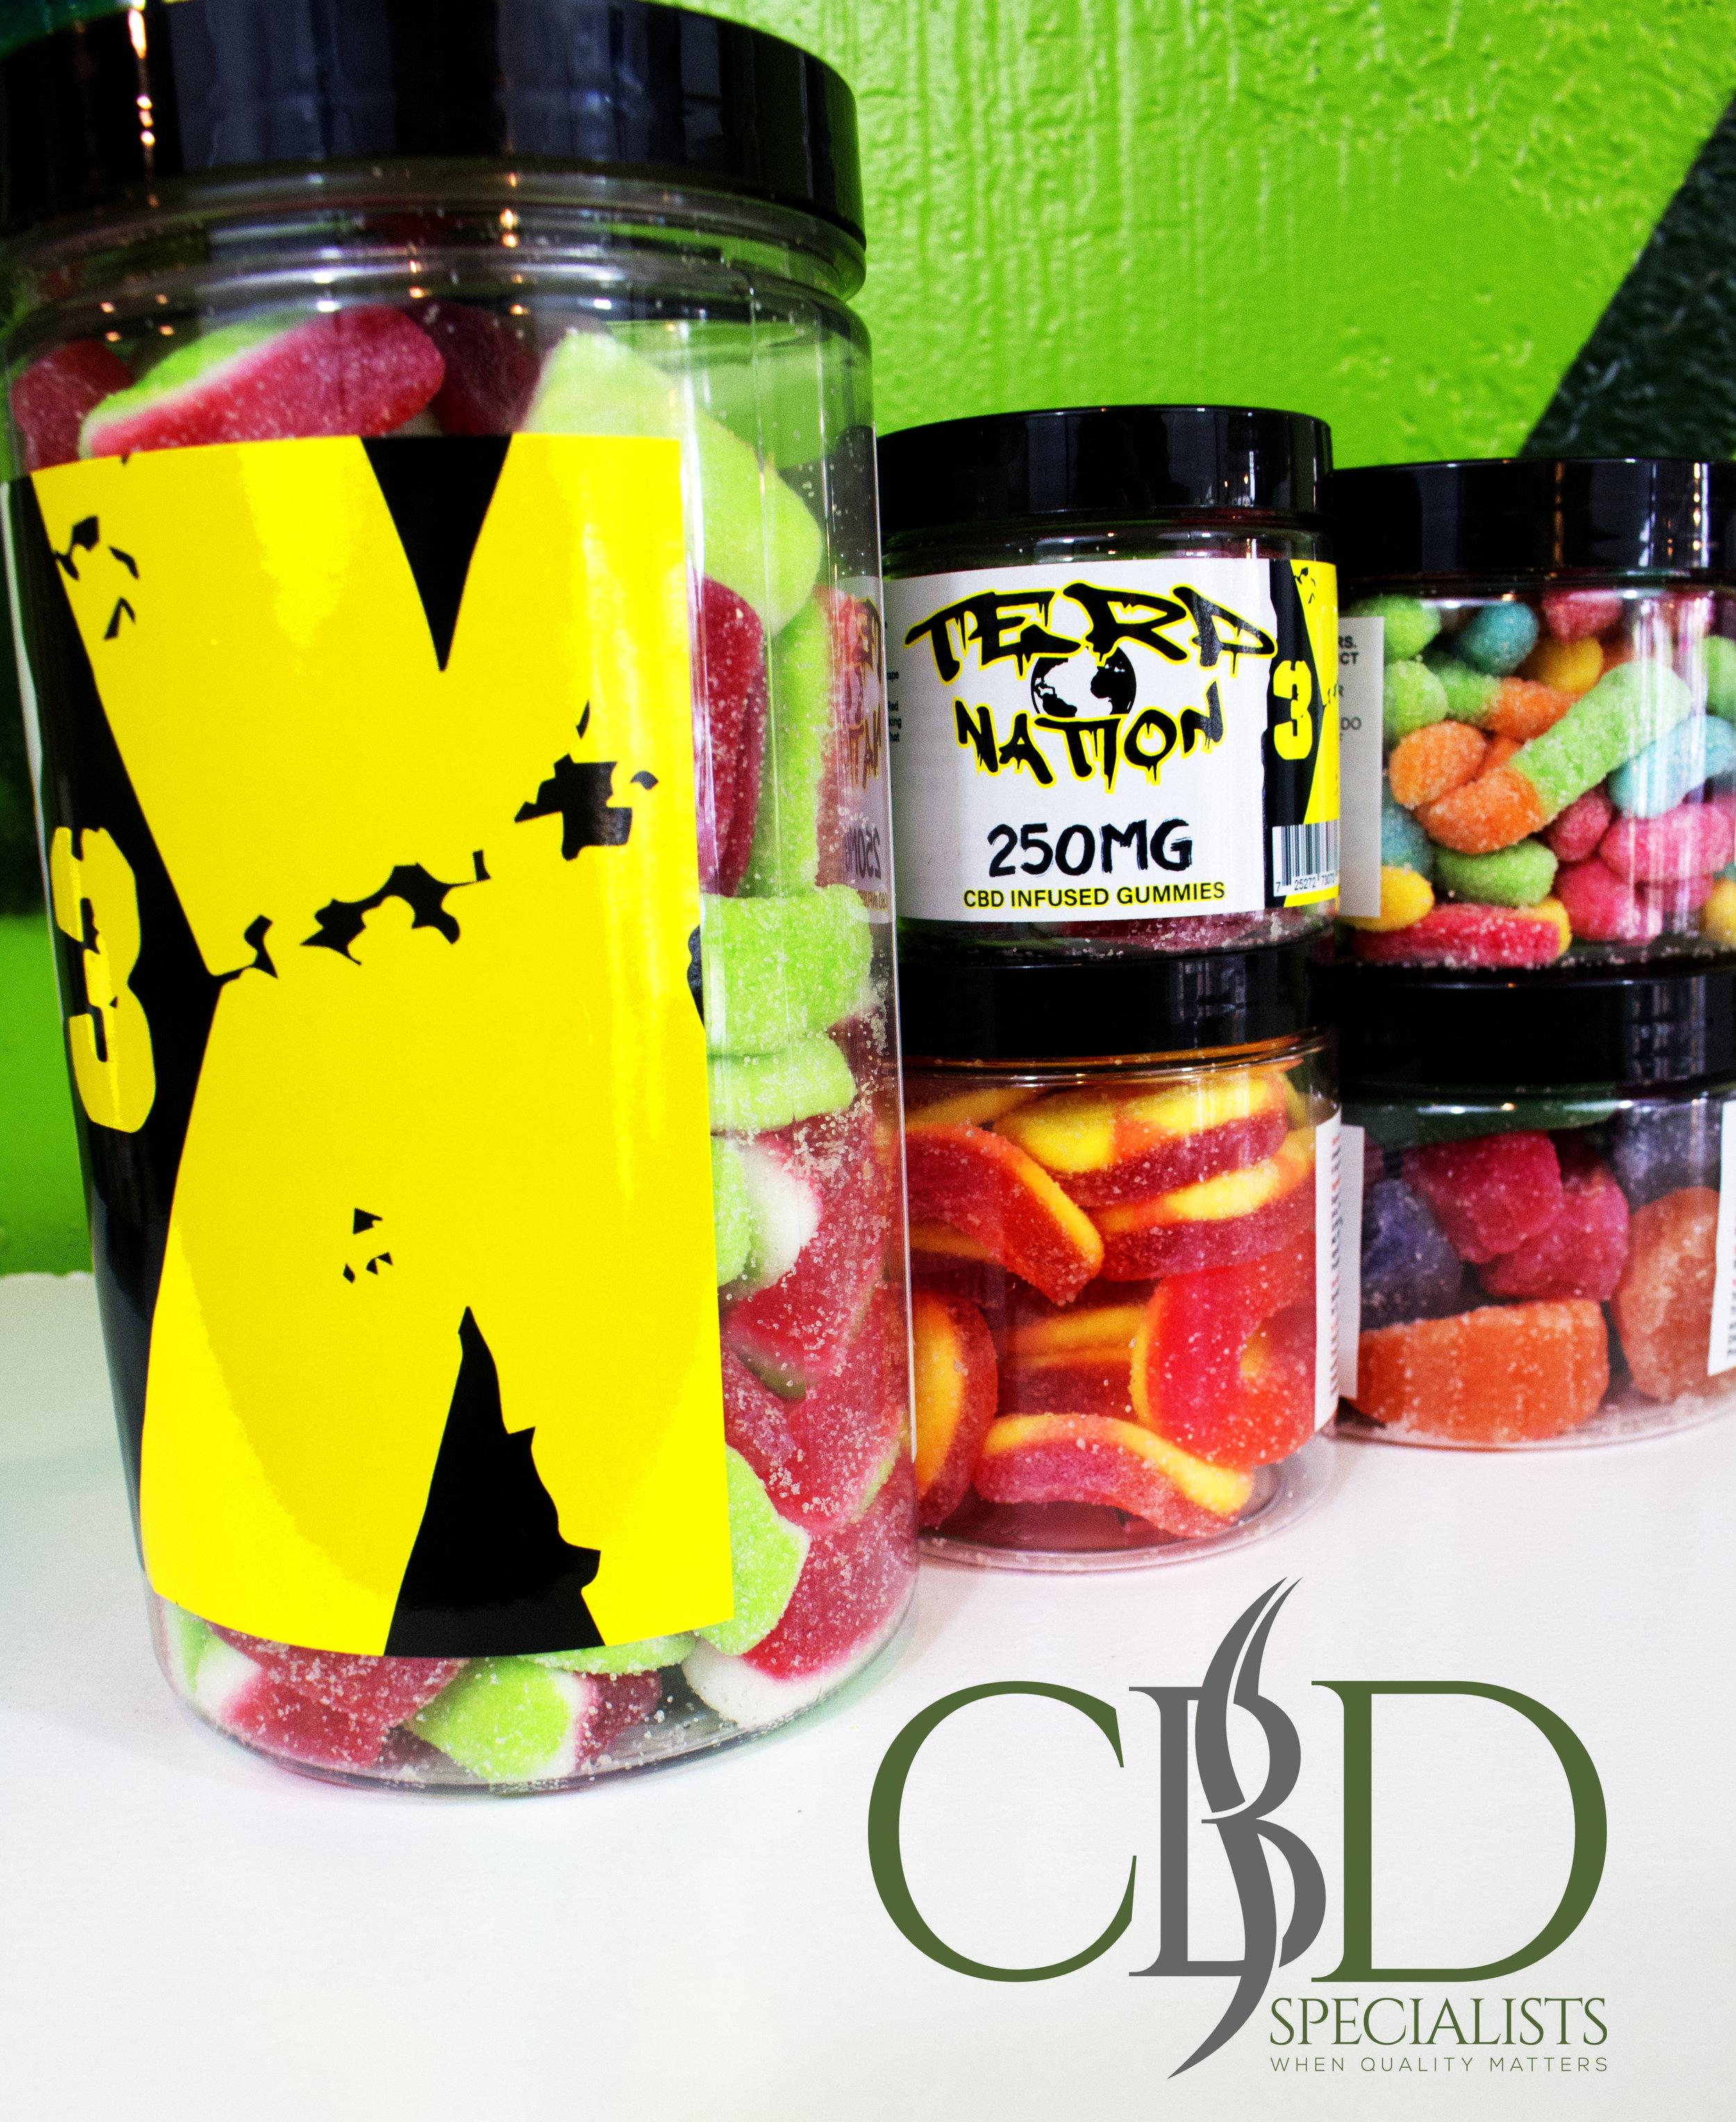 Terp Nation Gummies.jpg